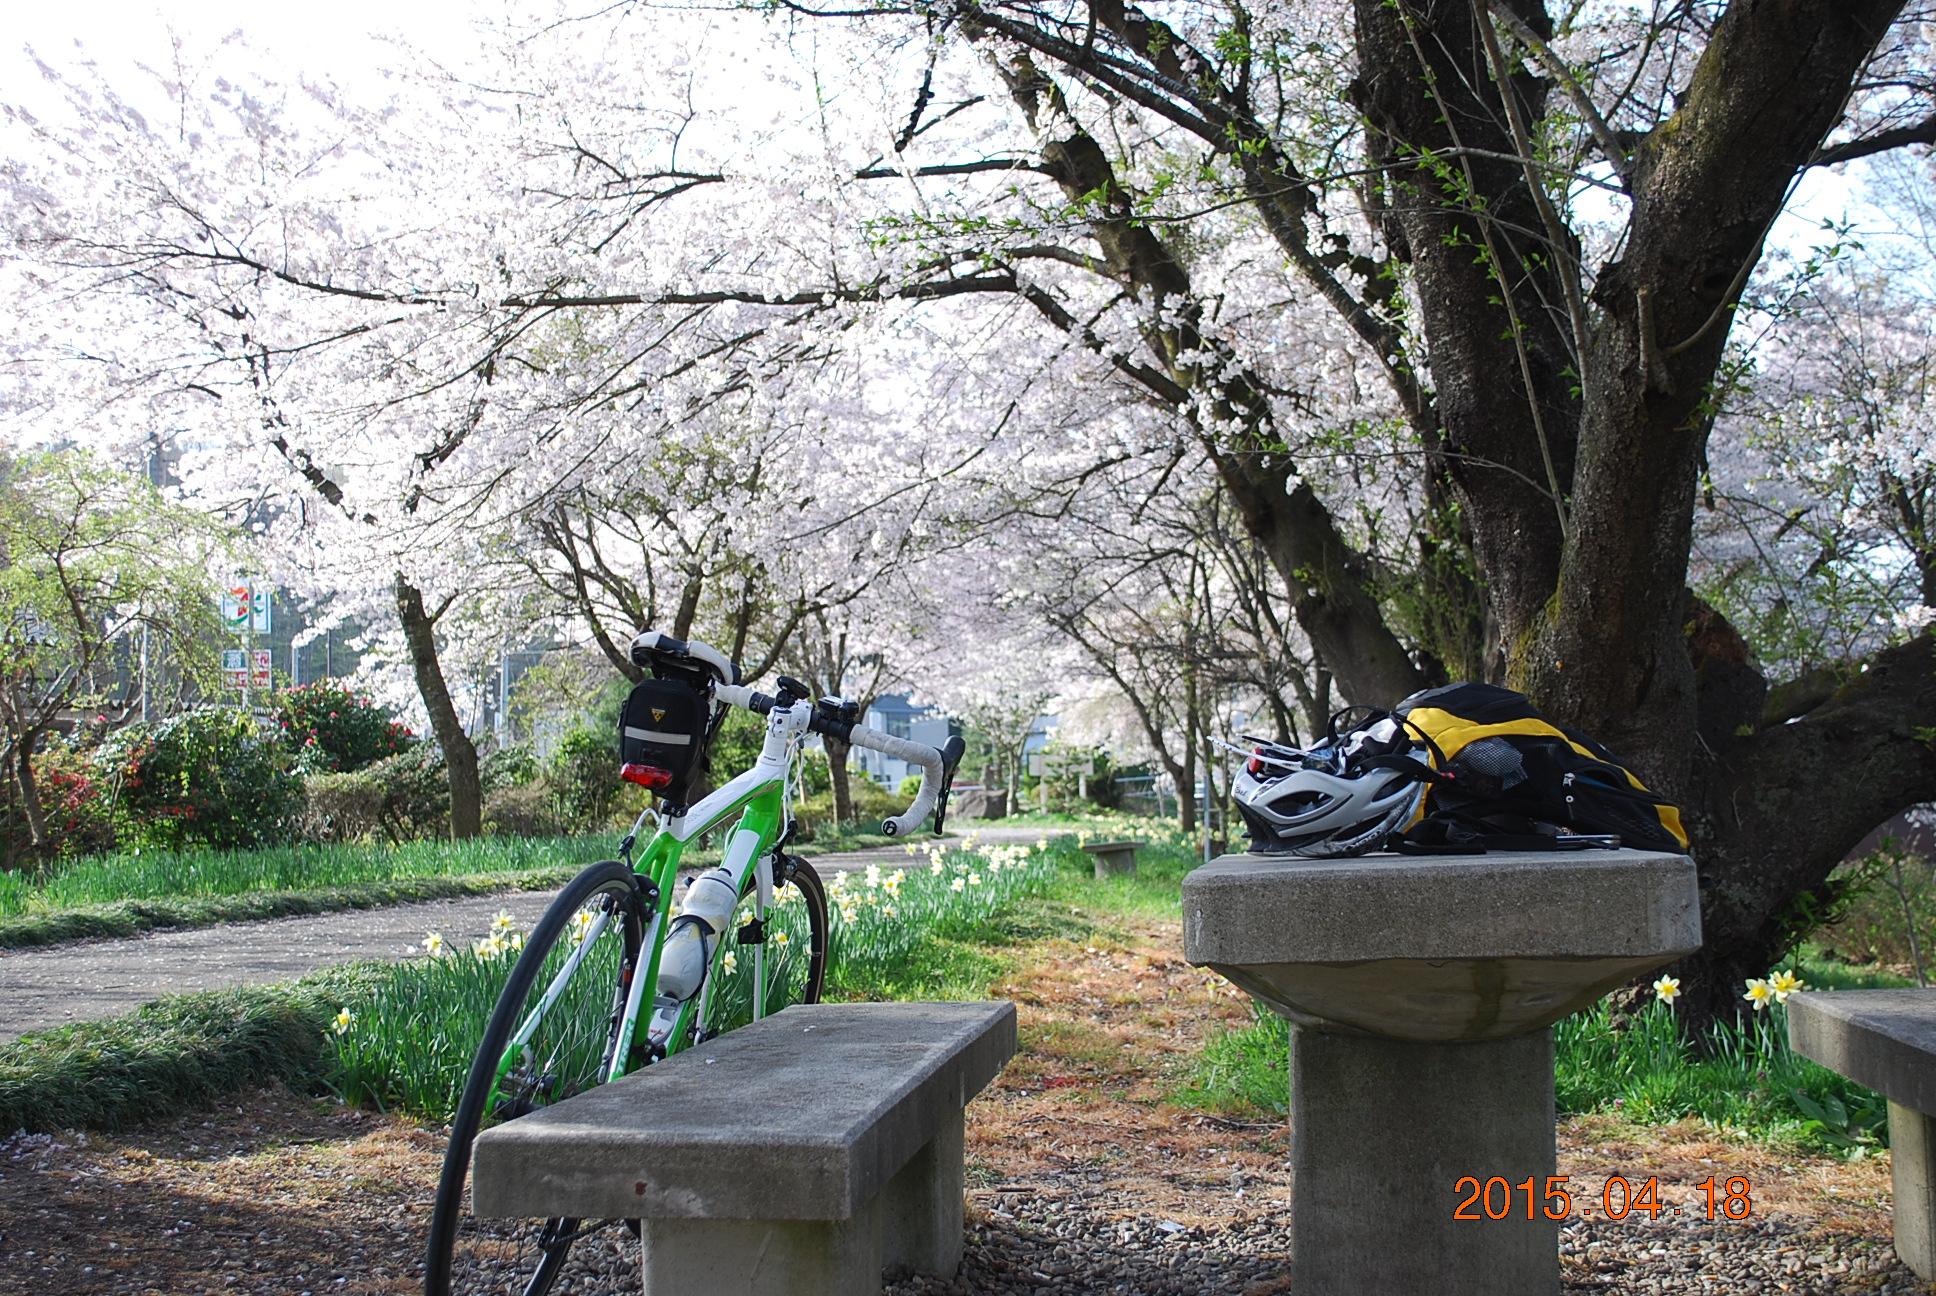 2015_0418_072550-DSC_4175.jpg